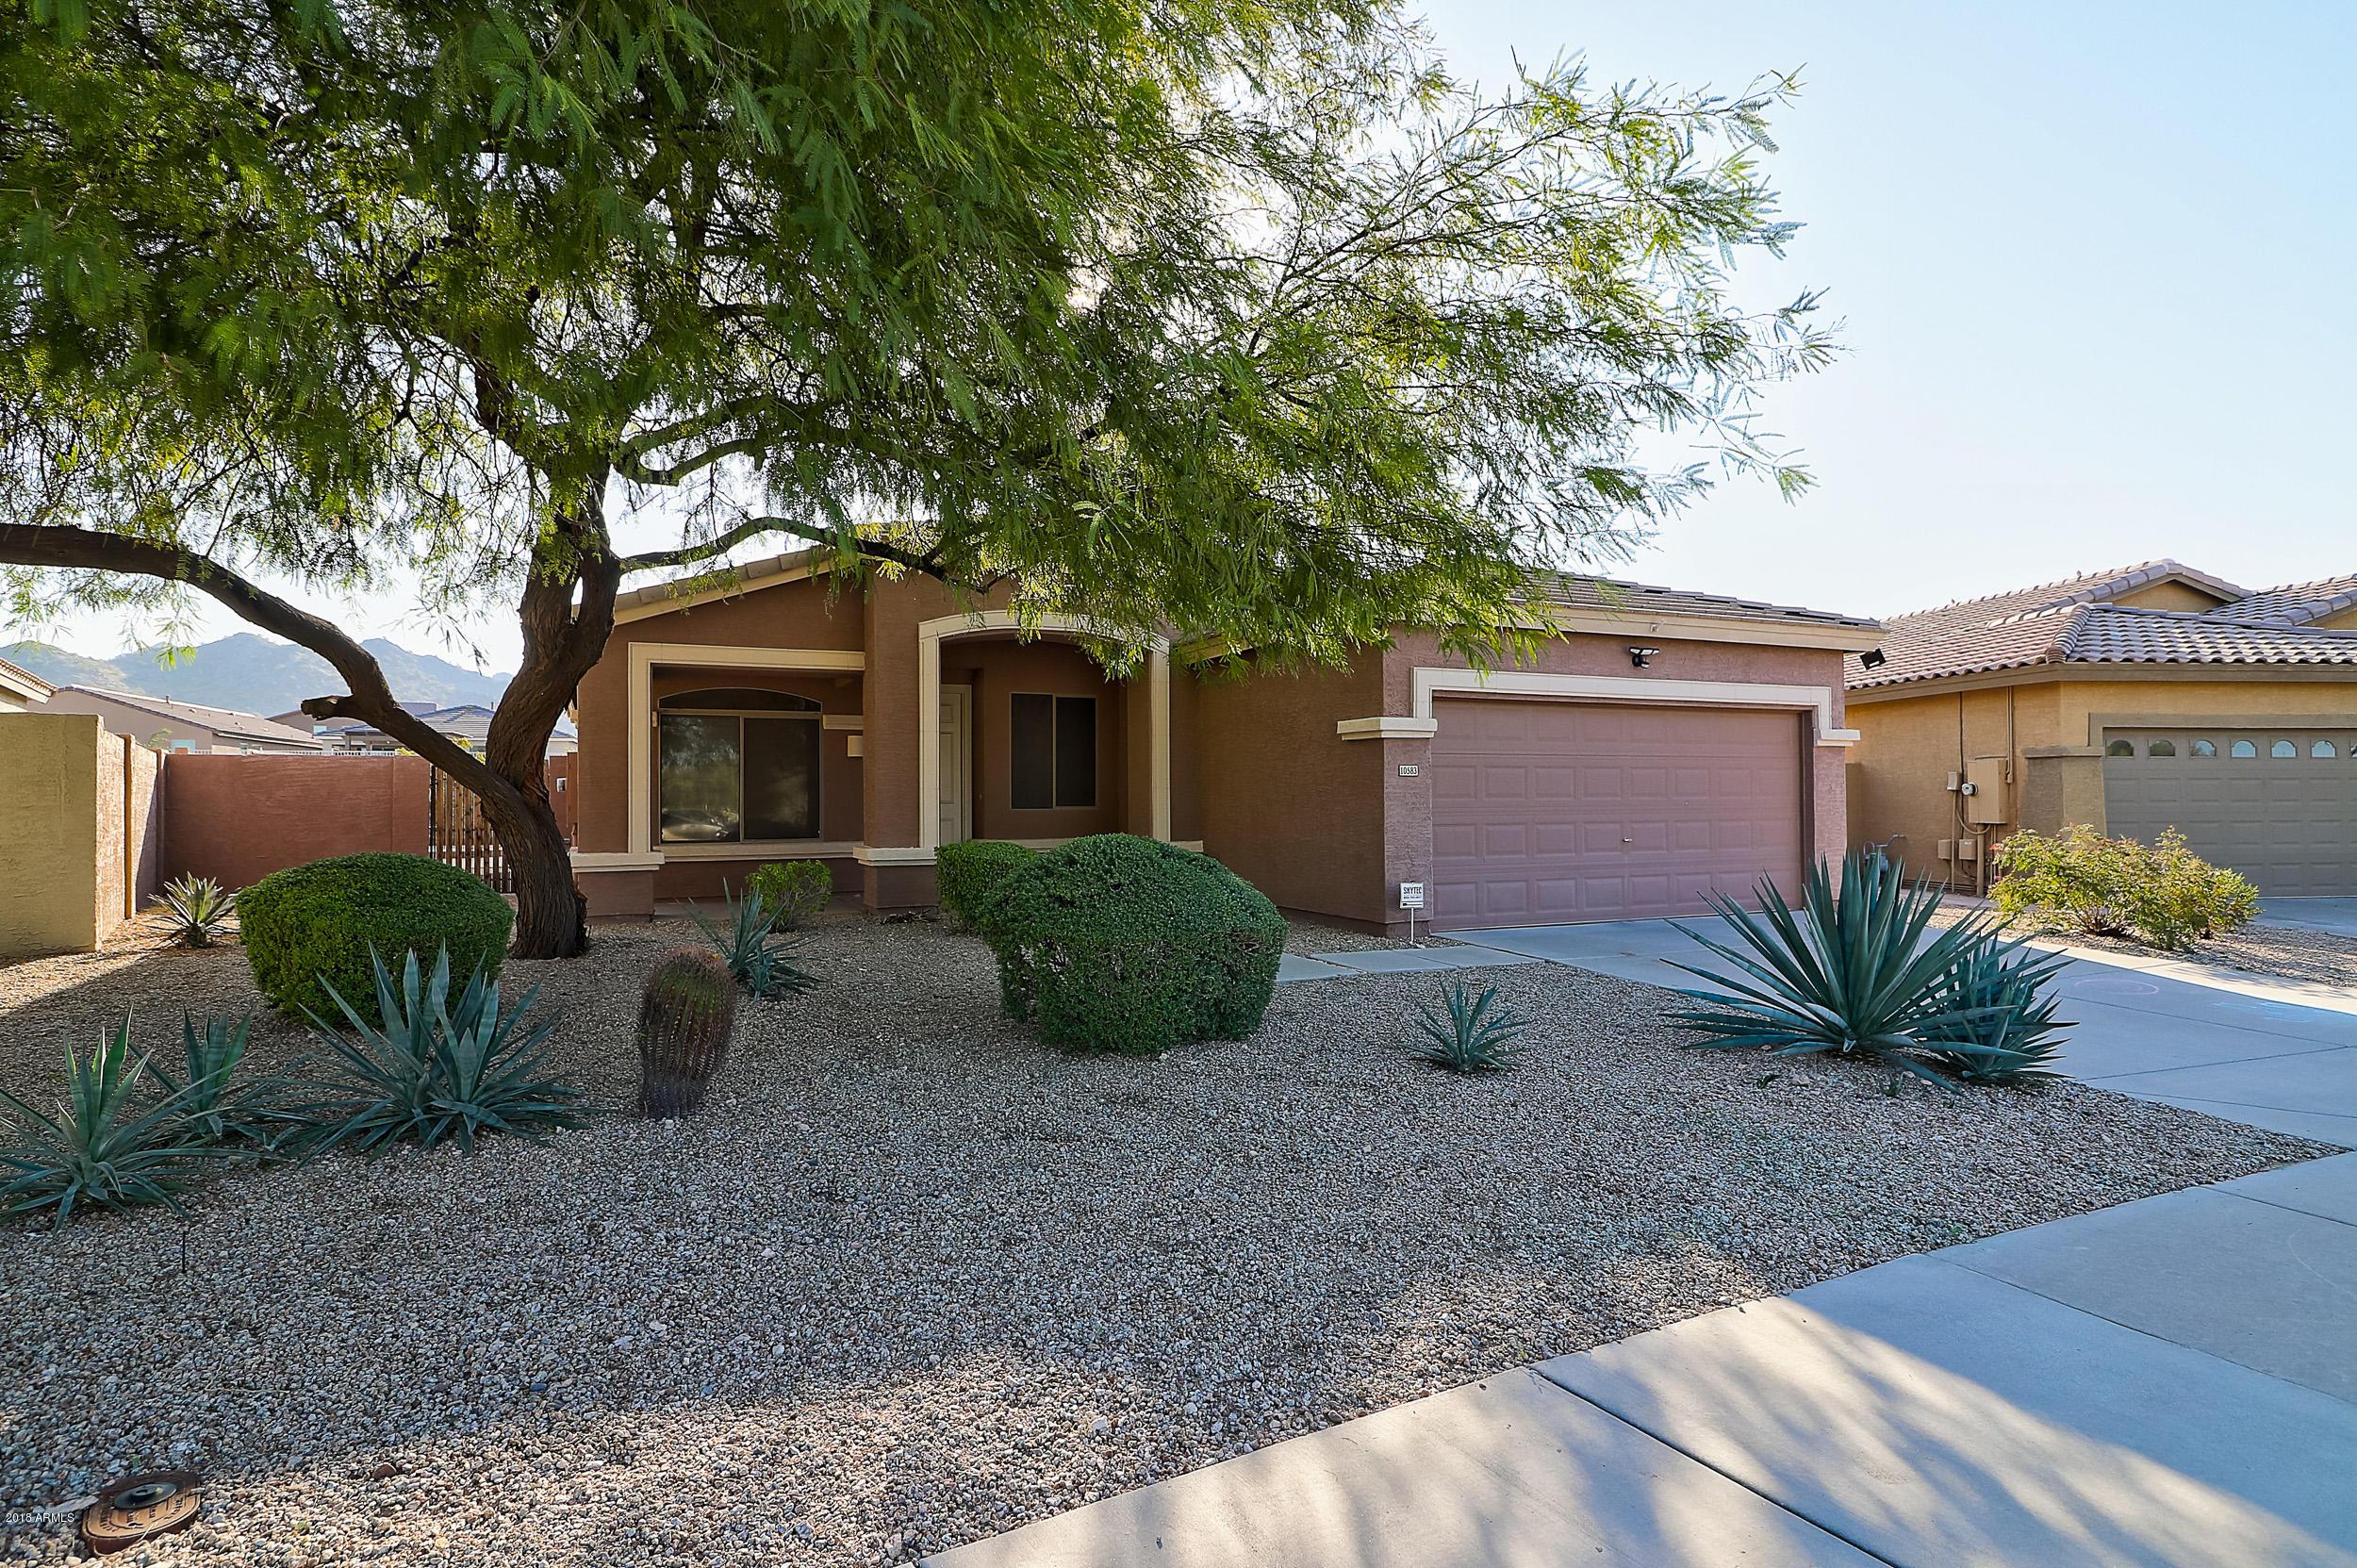 10583 175TH Avenue, Goodyear, Arizona 85338, 3 Bedrooms Bedrooms, ,2 BathroomsBathrooms,Residential Rental,For Rent,175TH,6062944